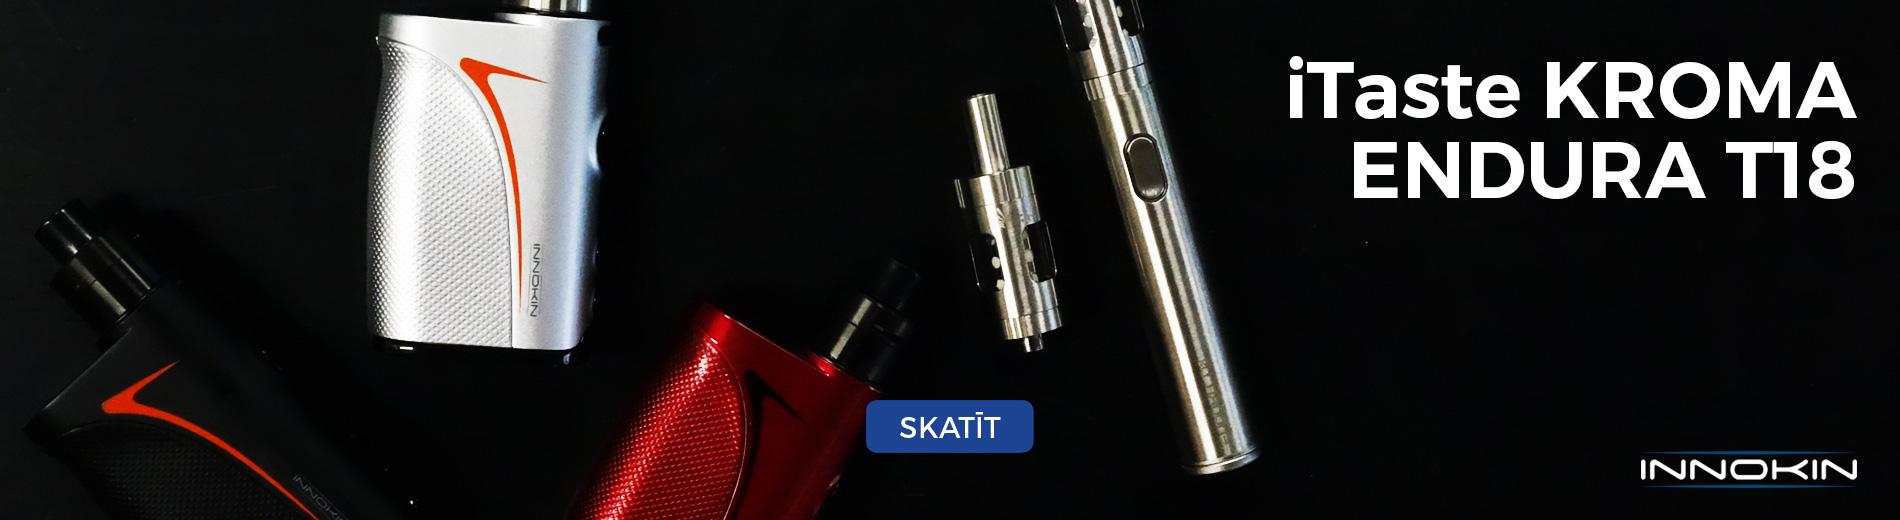 innokin e-cigaretes, elektroniskās cigaretes, itaste, kroma, slipstream, endura T18, airpuf